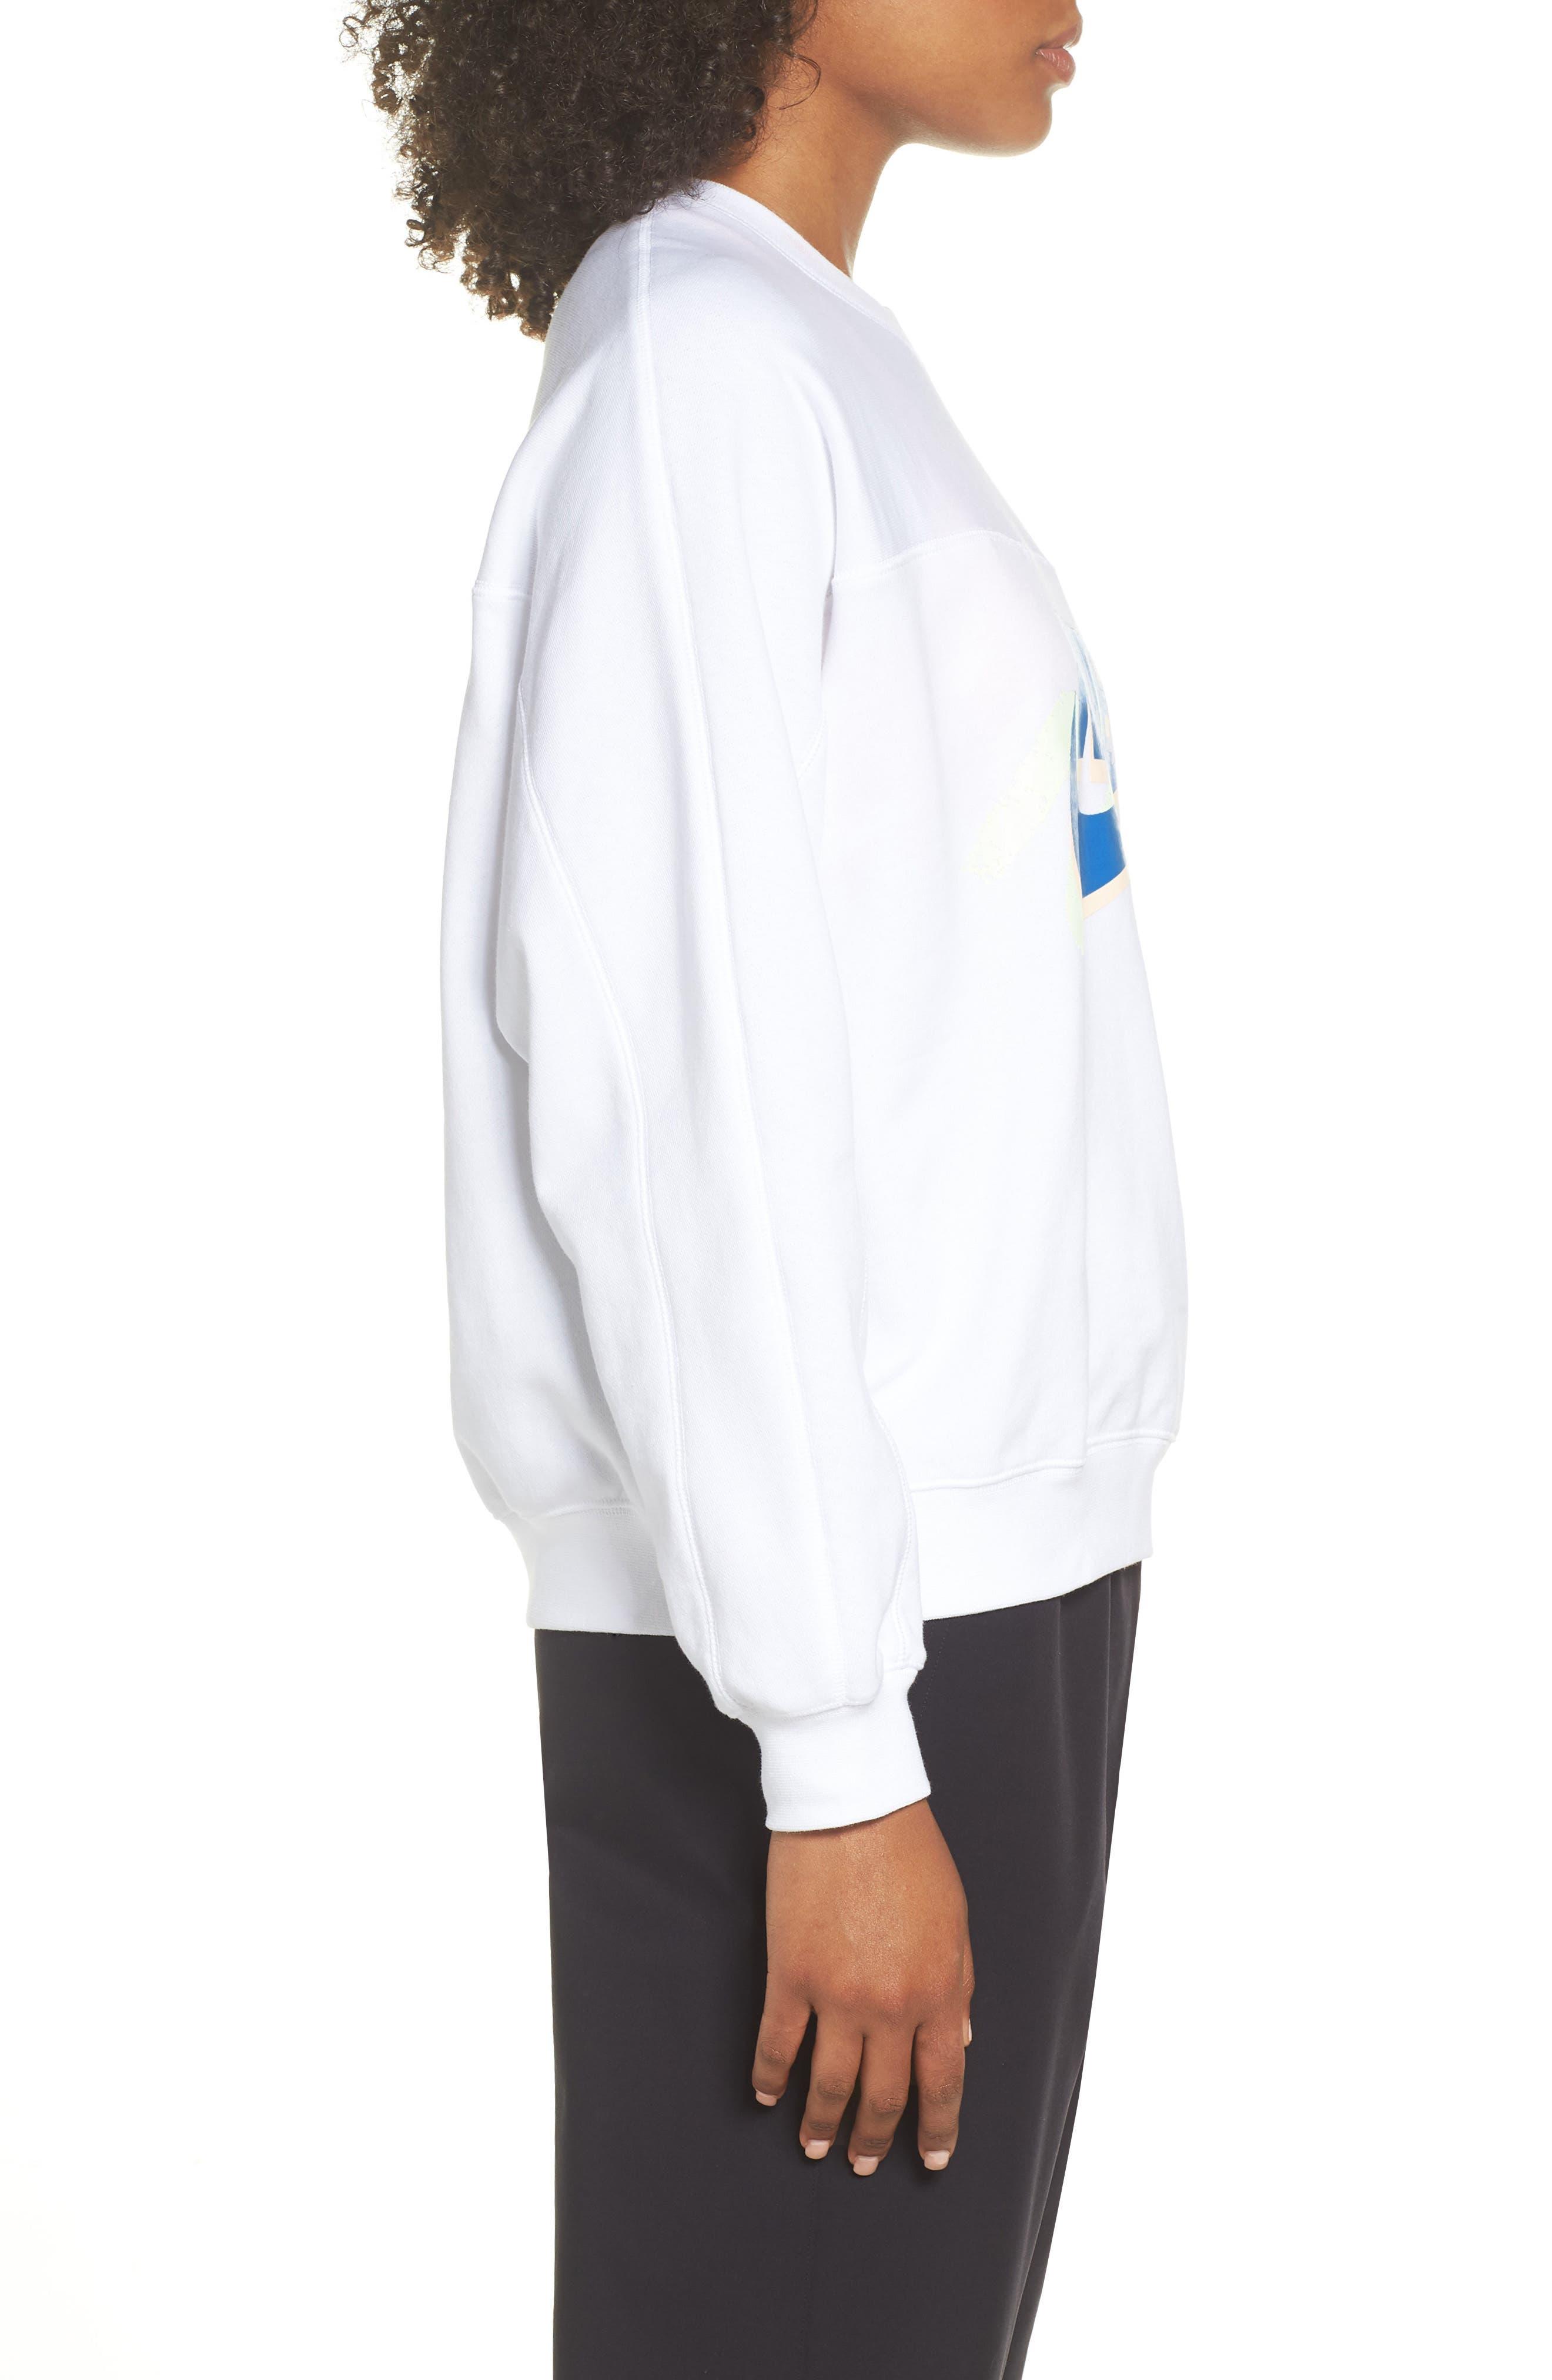 Sportswear Archive Women's Long Sleeve Crewneck Tee,                             Alternate thumbnail 6, color,                             WHITE/ WHITE/ WHITE